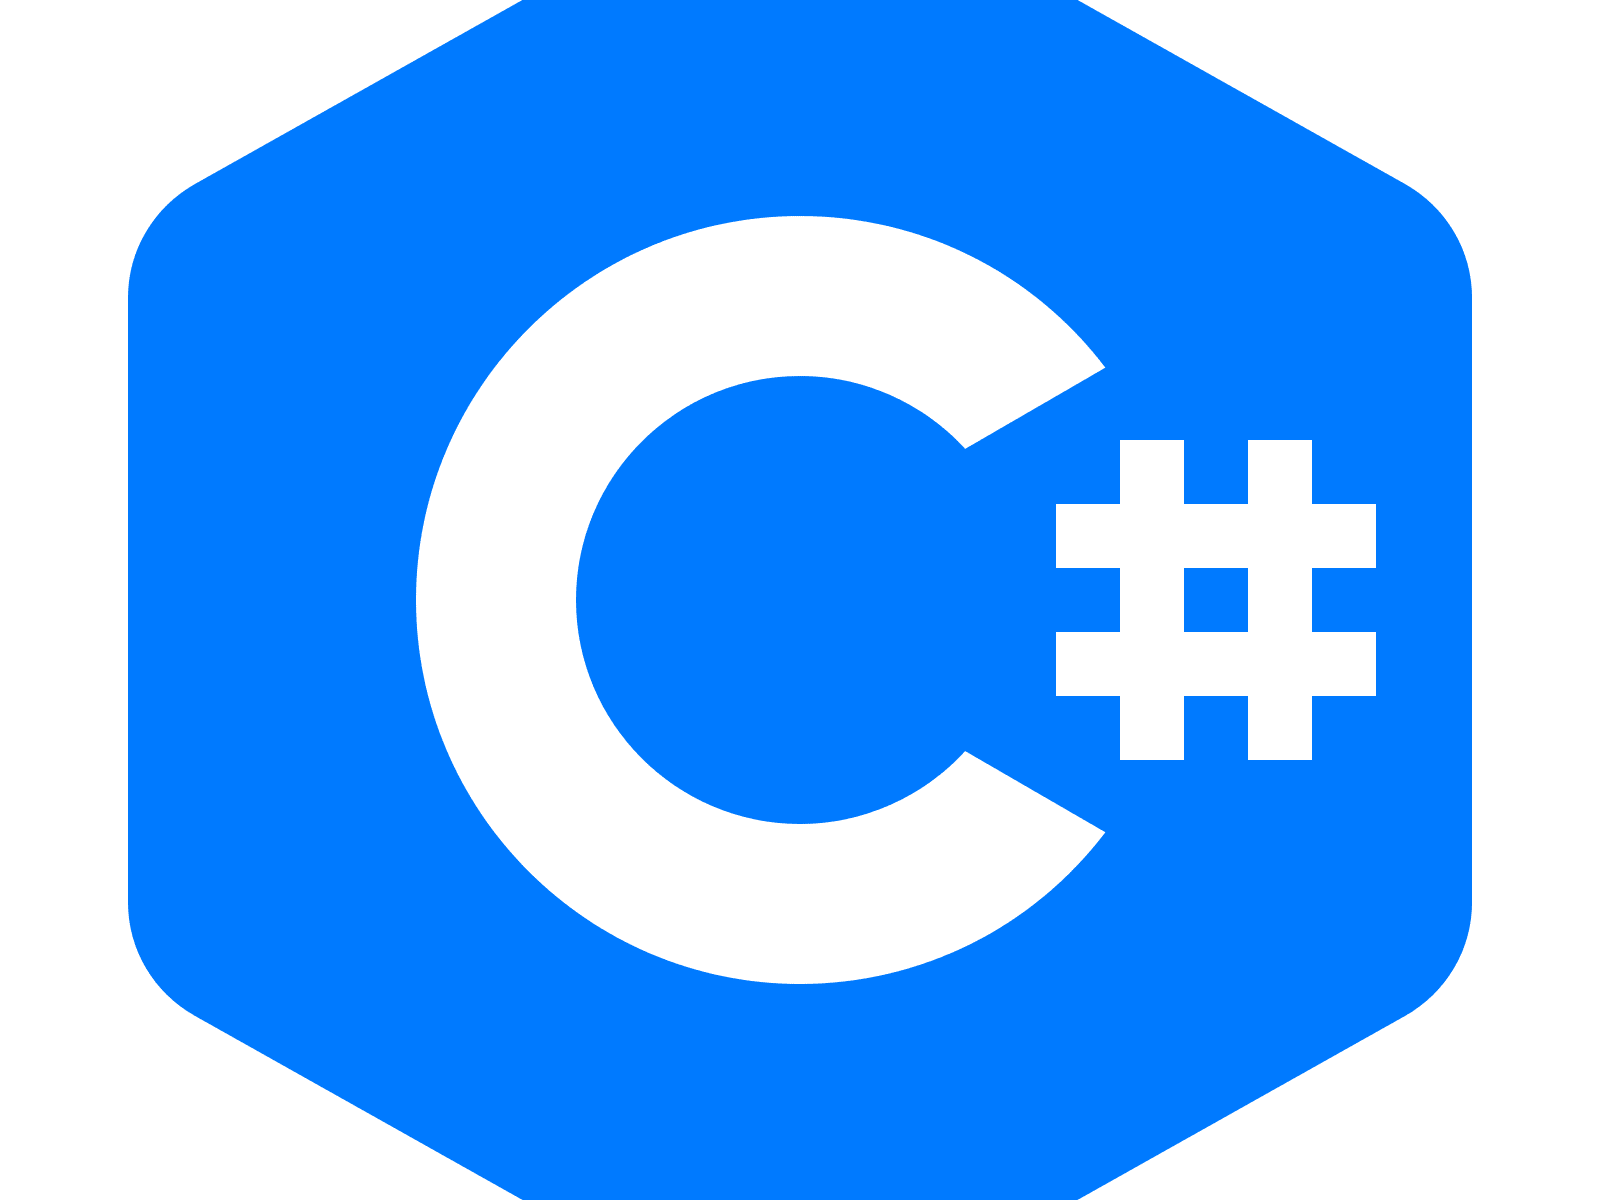 Sviluppo C#